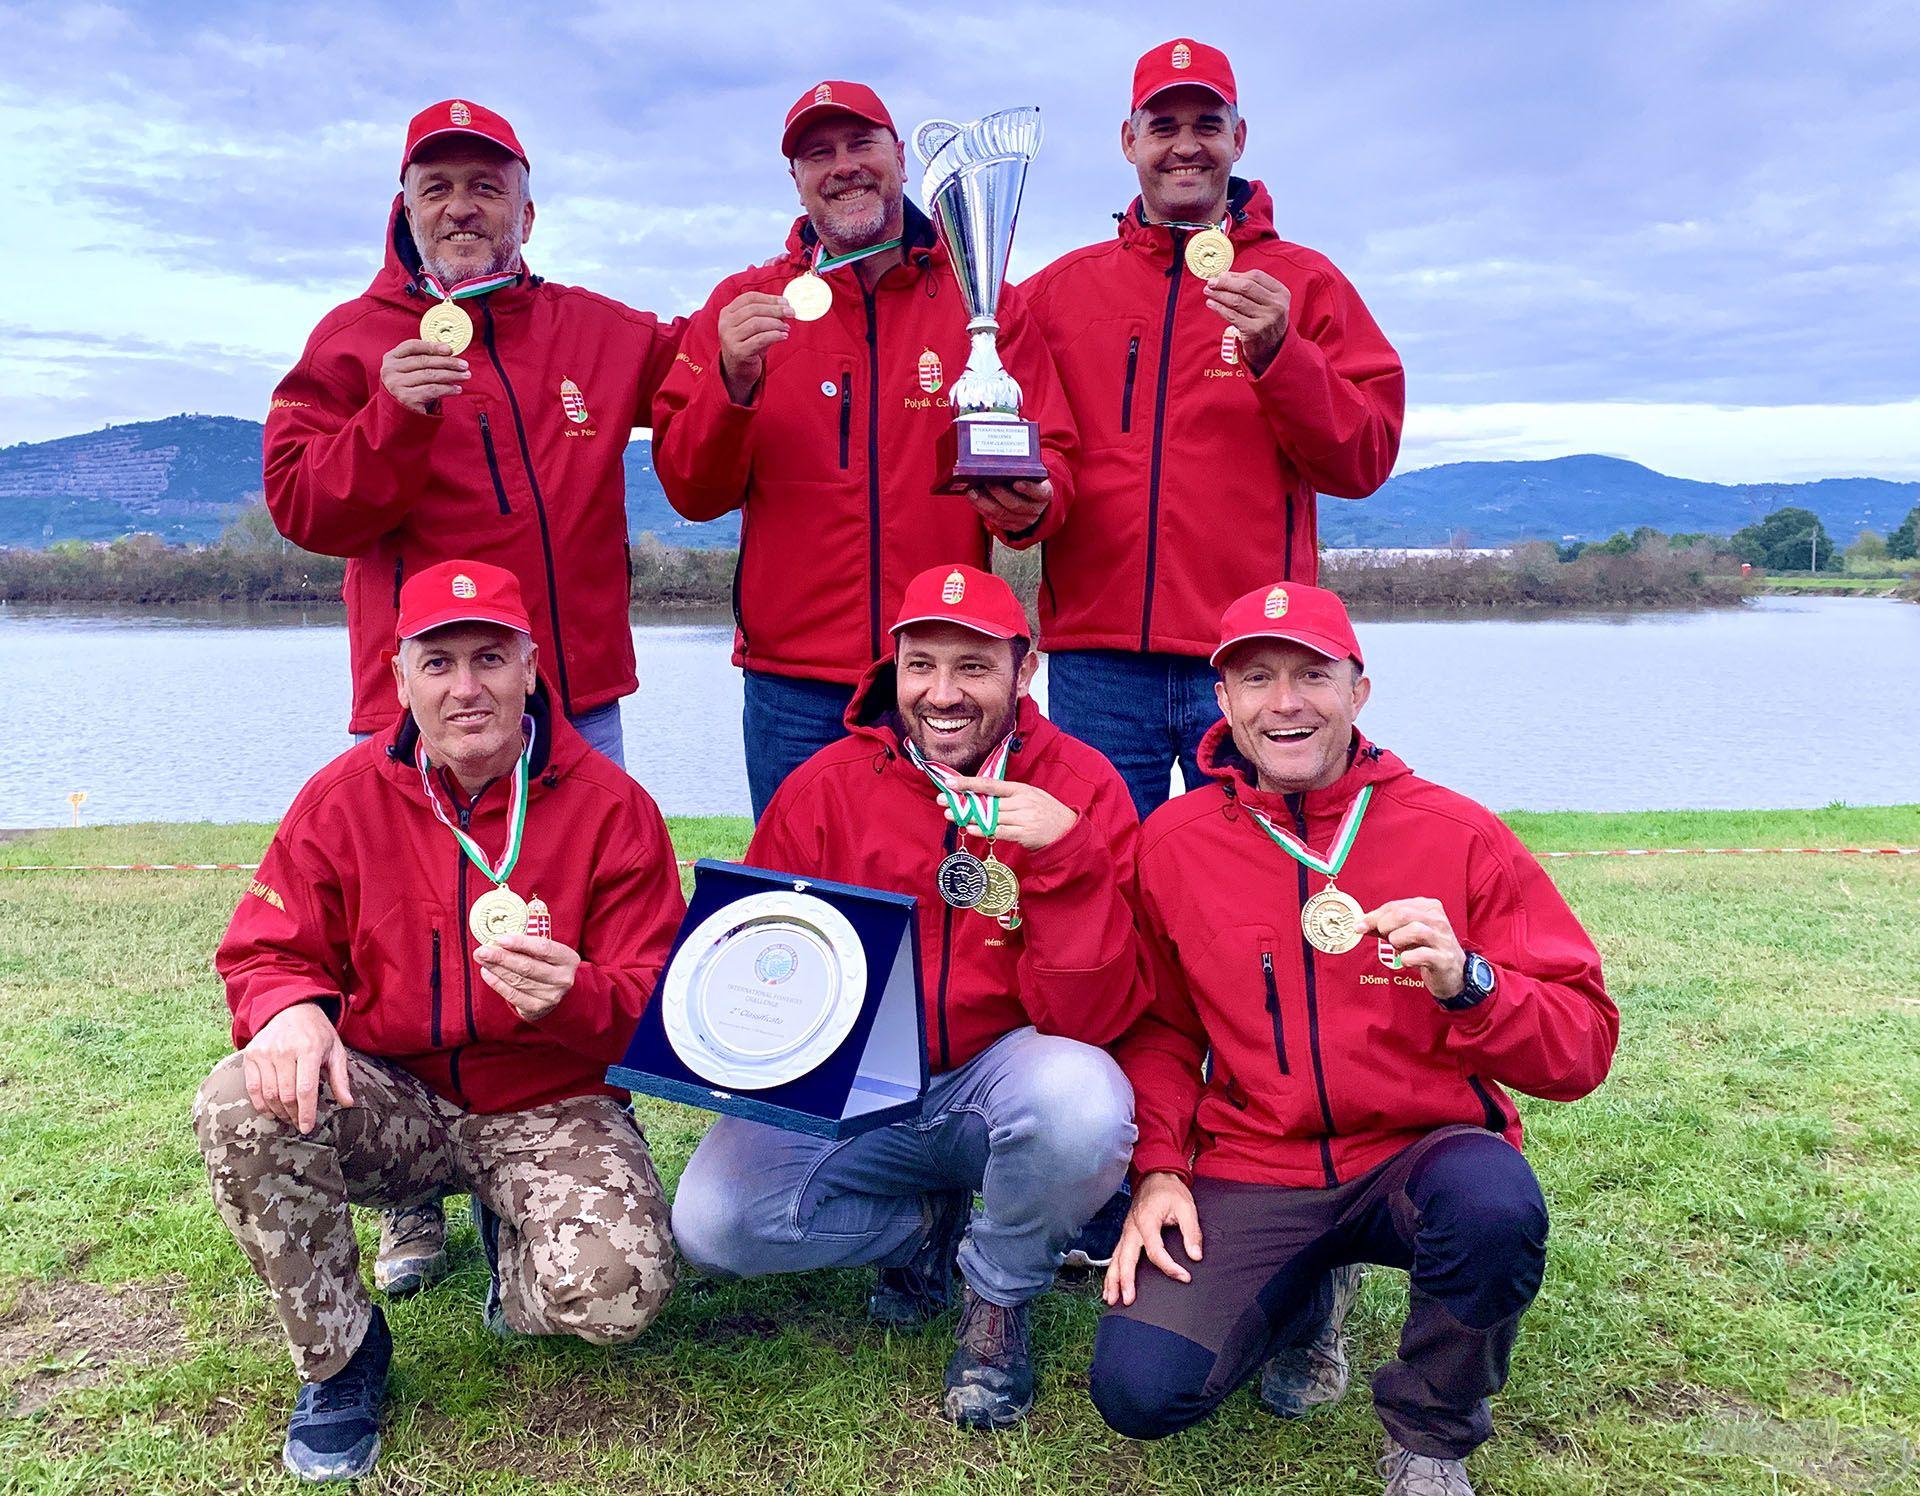 Az 1. International Feeder Challenge győztese, a Team Hungary